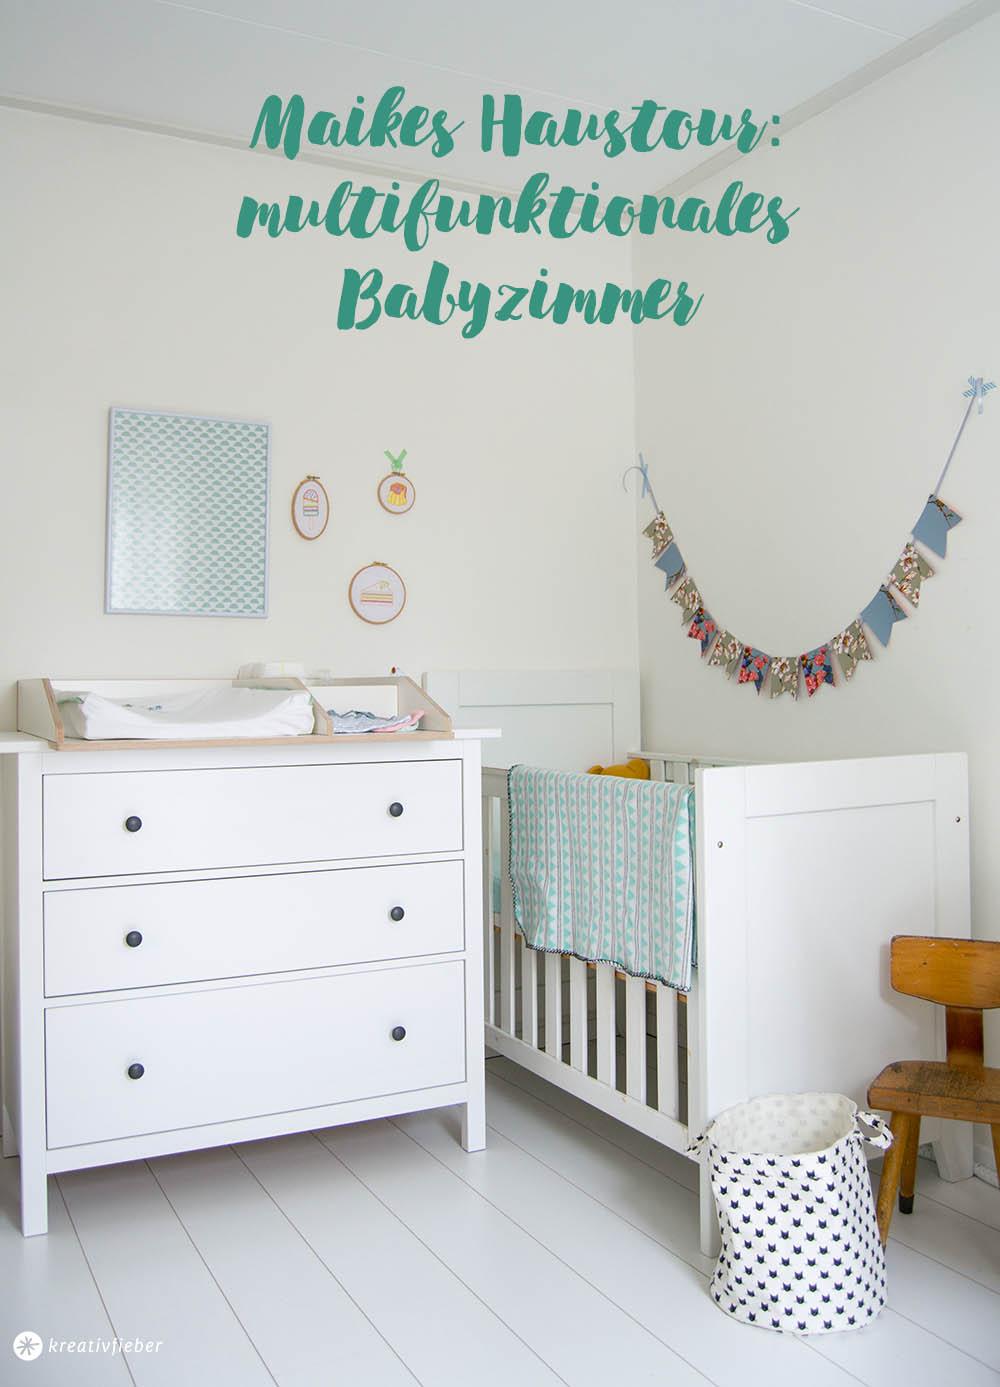 Full Size of Maikes Haustour Multifunktionales Babyzimmer Einrichten Regal Kinderzimmer Regale Sofa Weiß Kinderzimmer Einrichtung Kinderzimmer